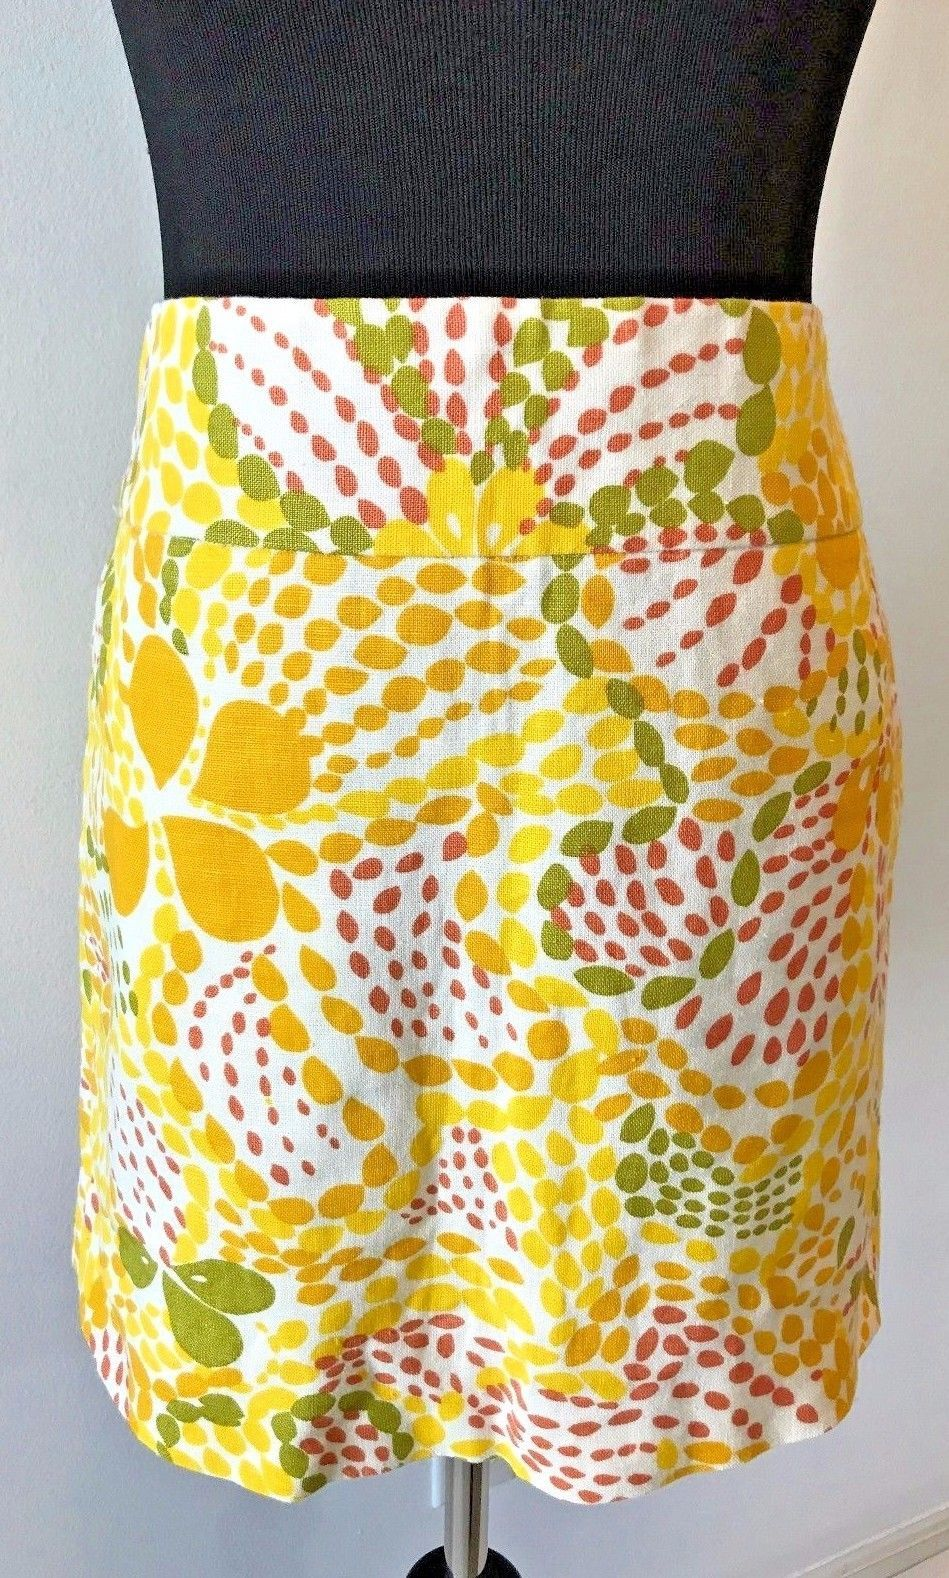 db934e9ffa S l1600. S l1600. Previous. J Crew 100% Linen Yellow Green Burnt Orange  White Floral Mini Skirt size 0 SK6